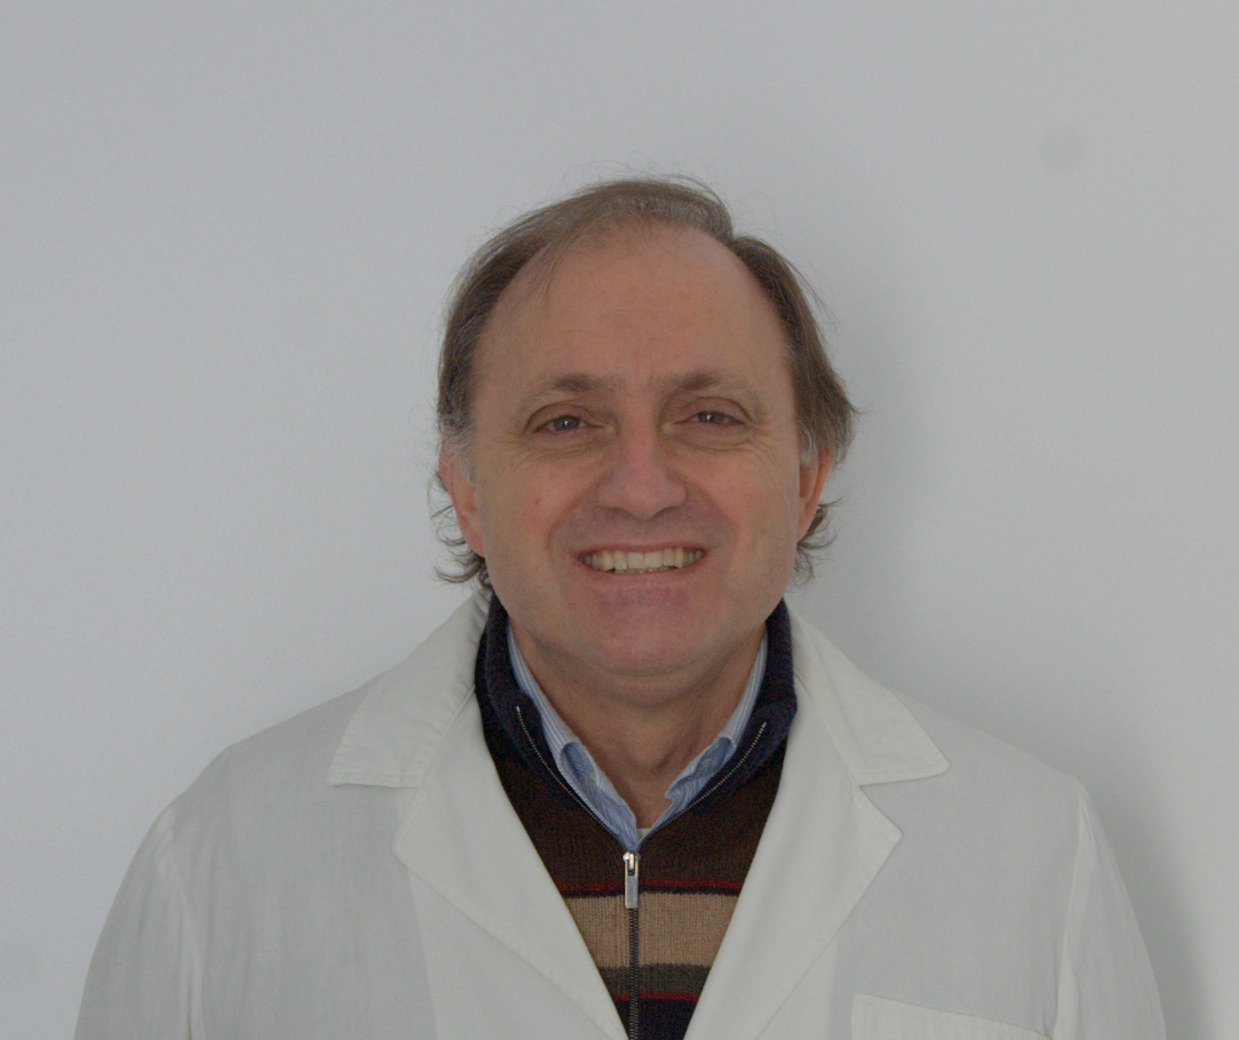 Dott. Claudio Carnicelli